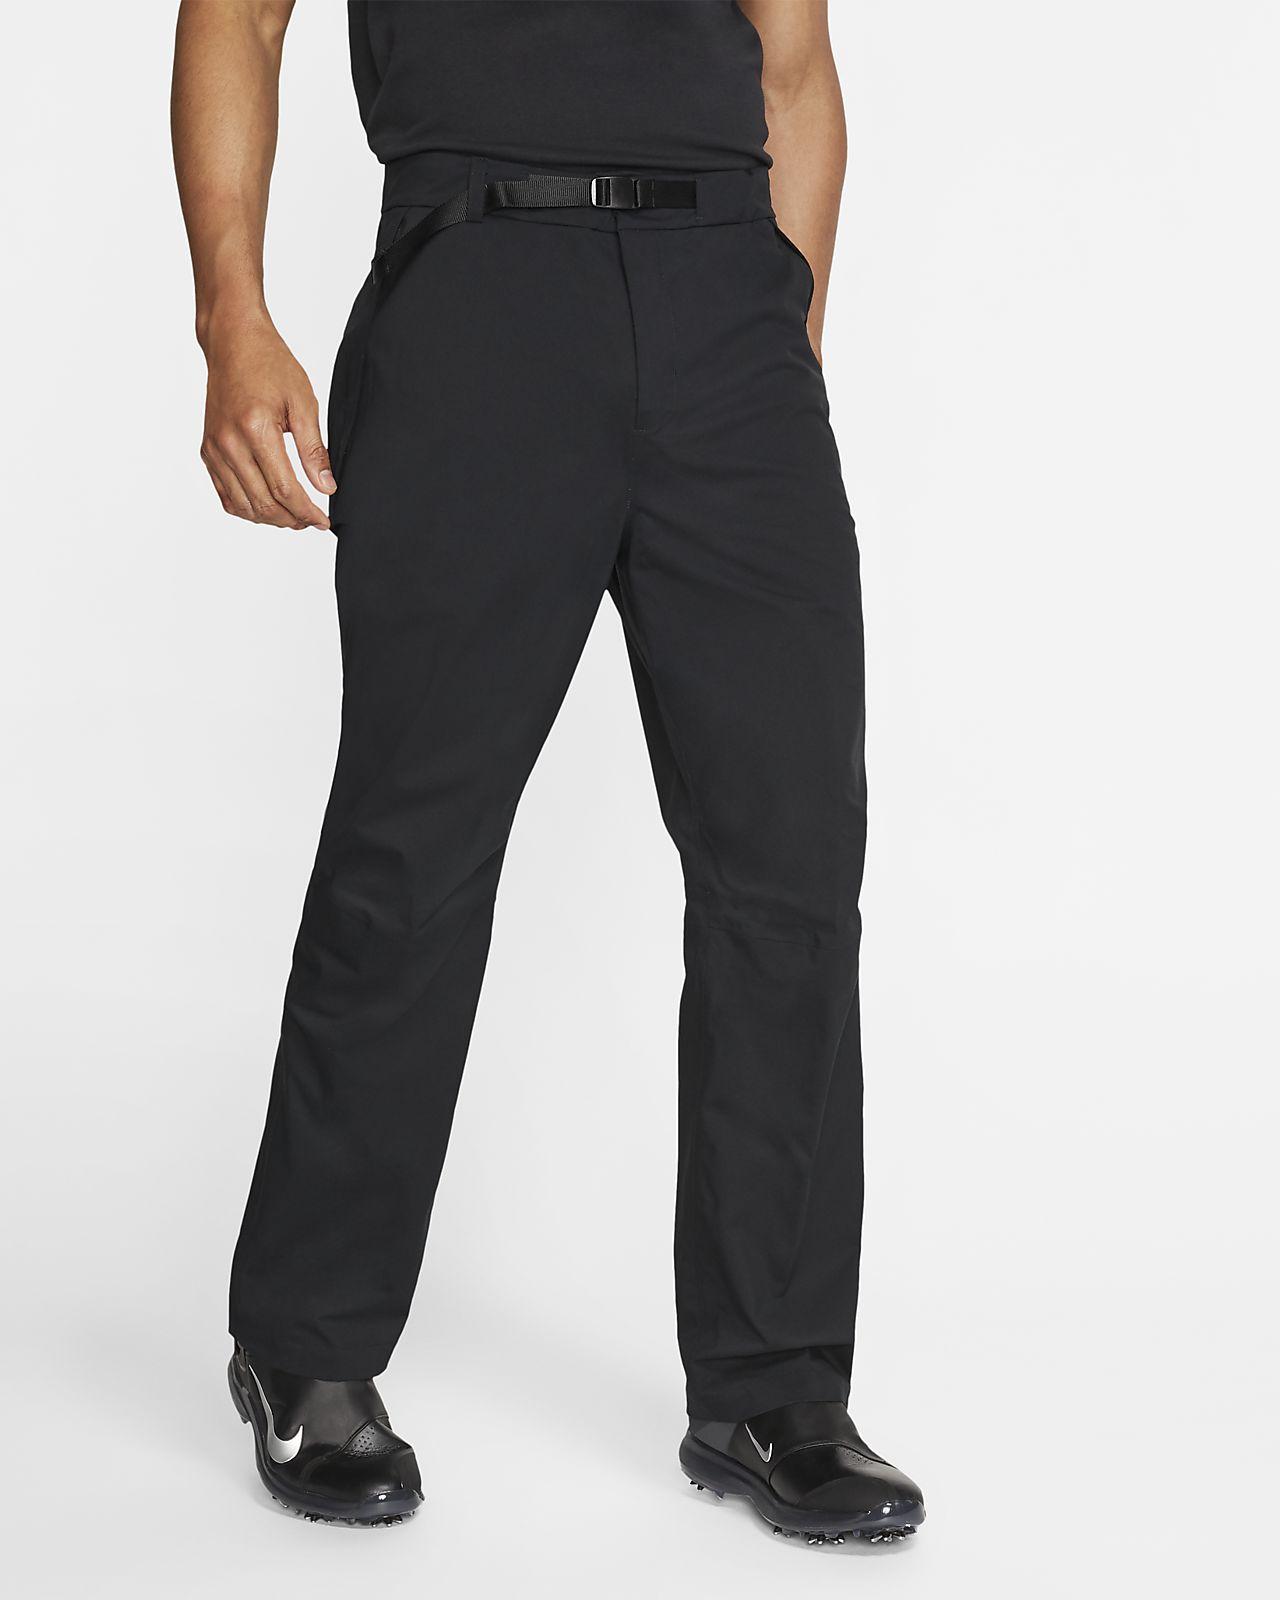 Pantalones de golf para hombre Nike HyperShield